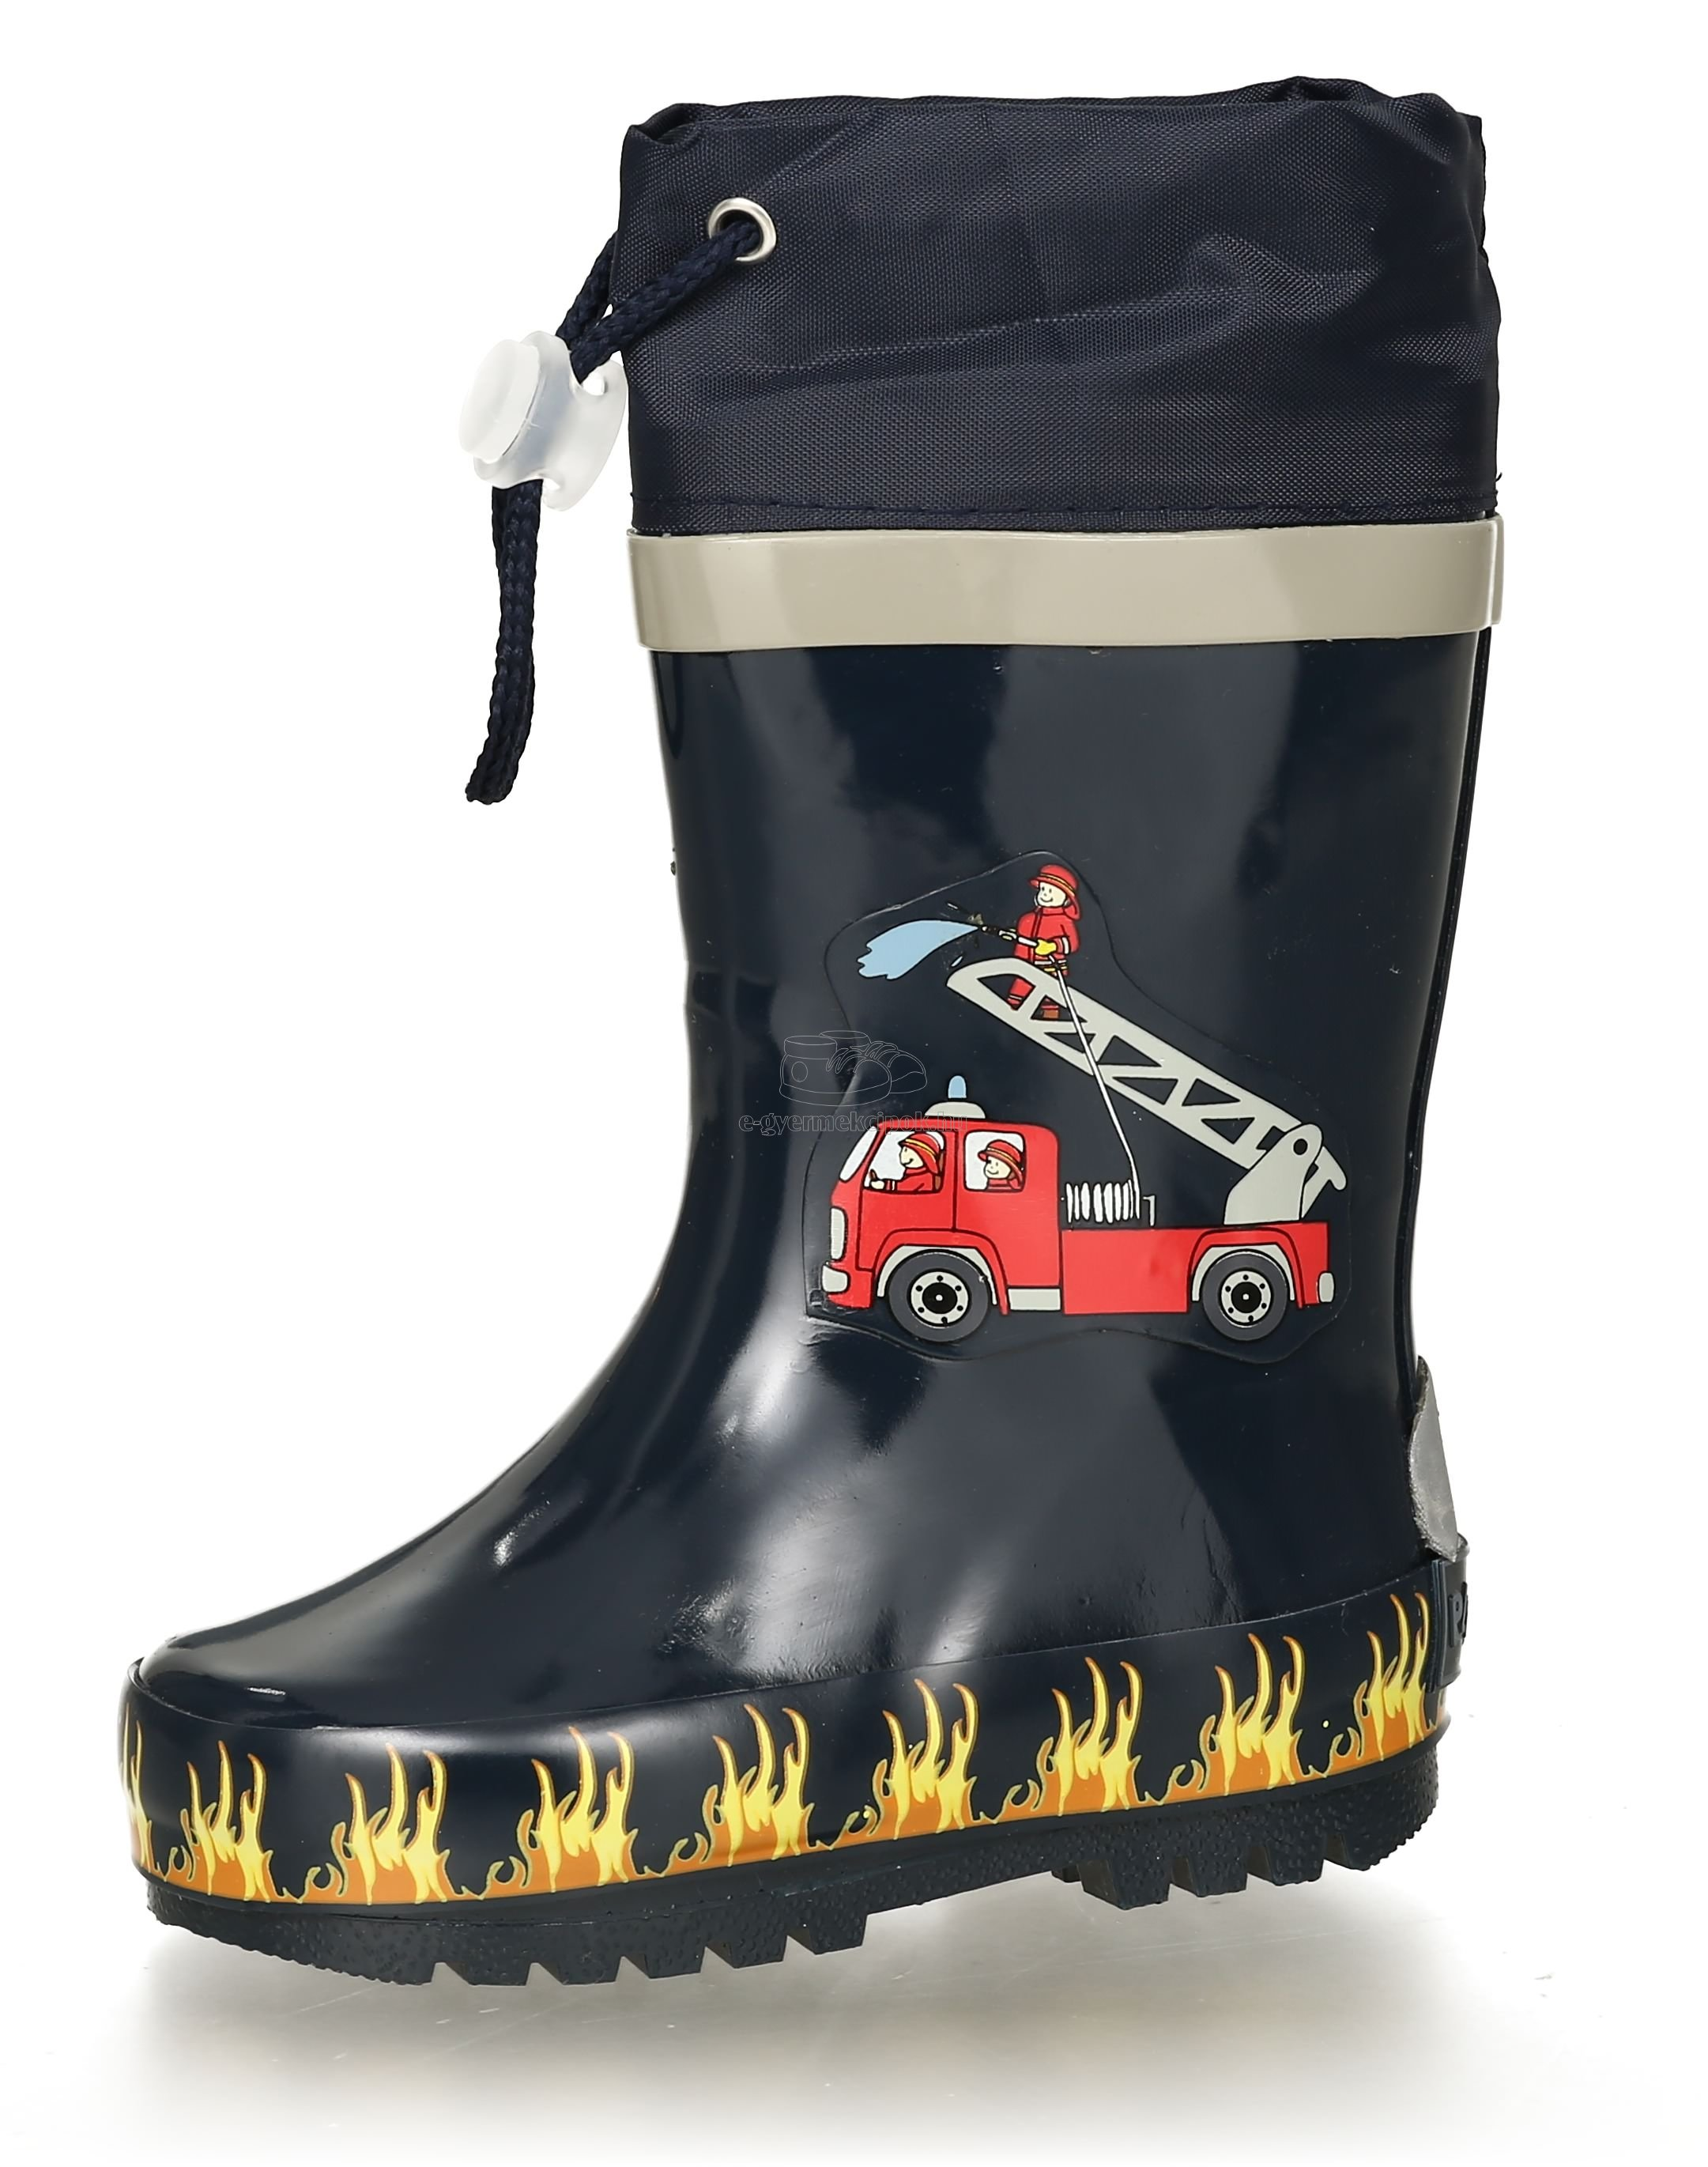 Gyerek gumicsizma Playshoes 188590 Fire Brigade